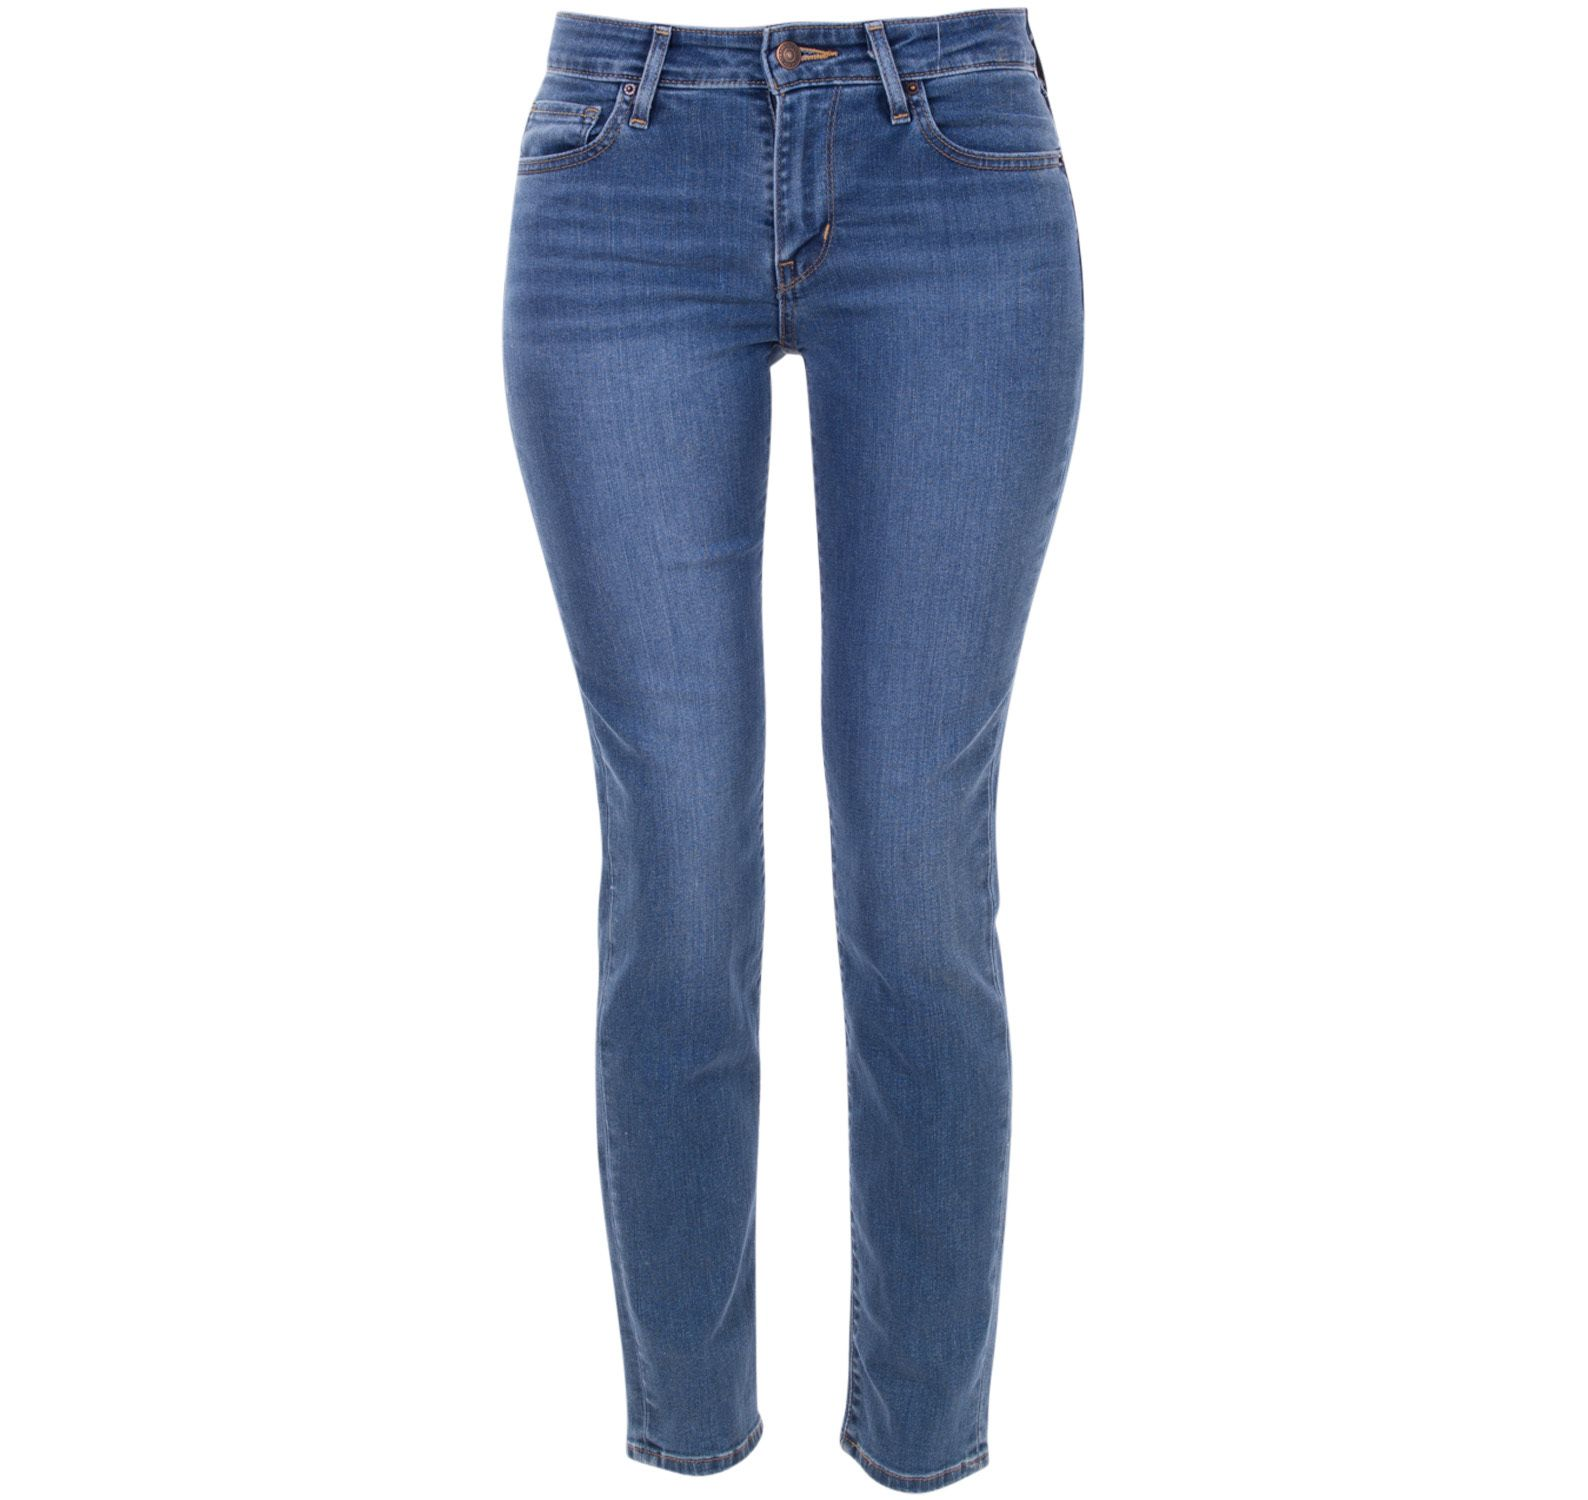 712 slim blue vista, blues, 25/32,  levi's jeans